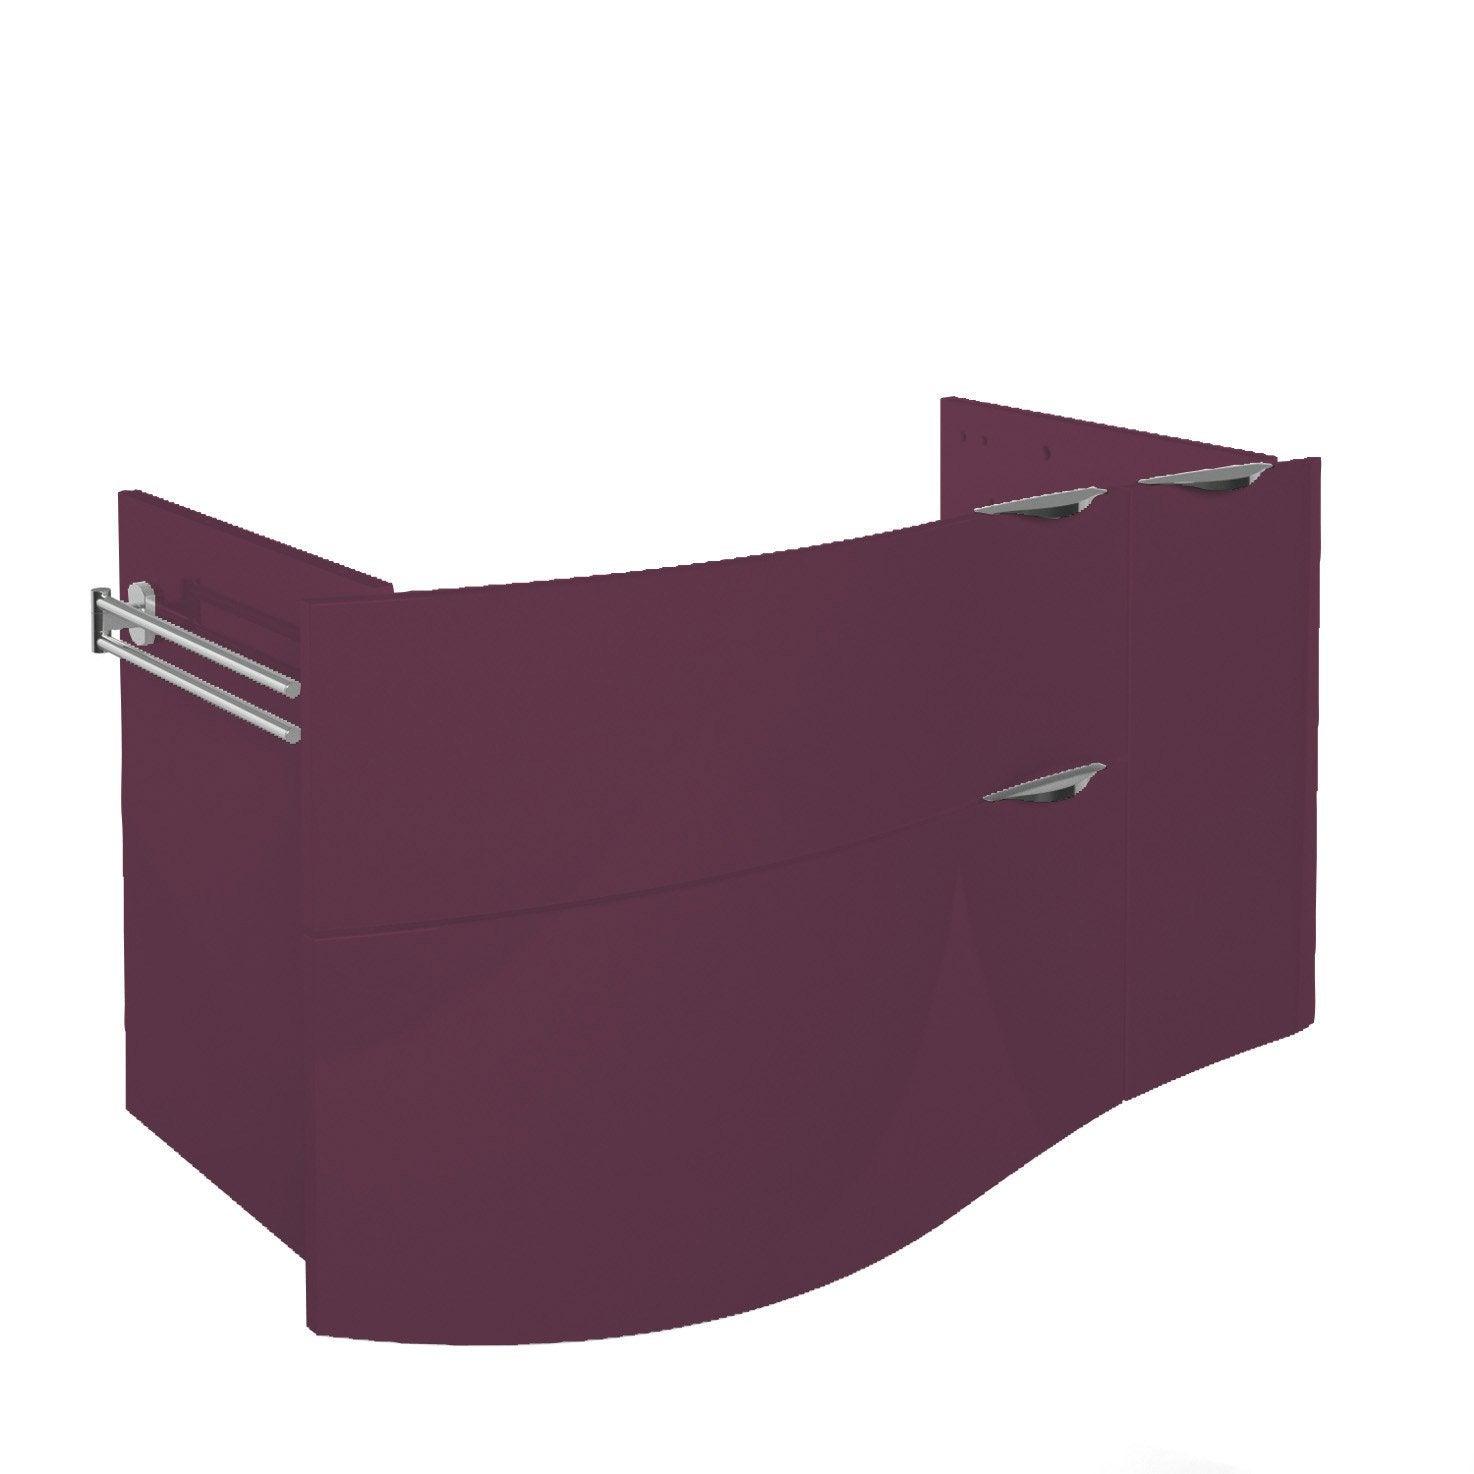 meuble sous vasque x x cm violet elegance leroy merlin. Black Bedroom Furniture Sets. Home Design Ideas